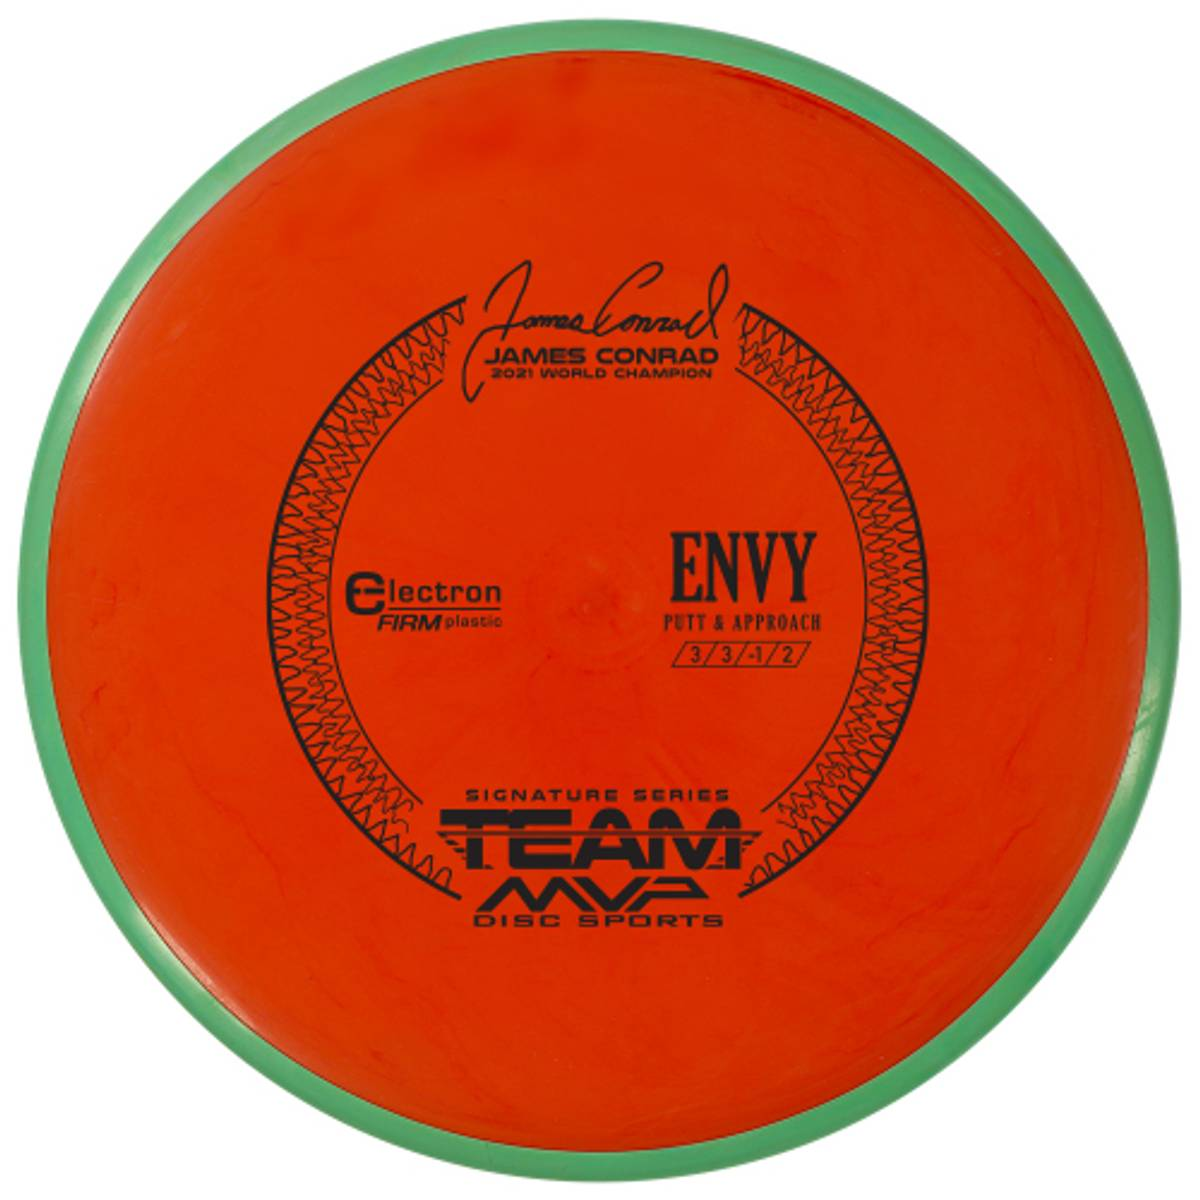 Axiom Electron Envy Firm - James Conrad Signature Series